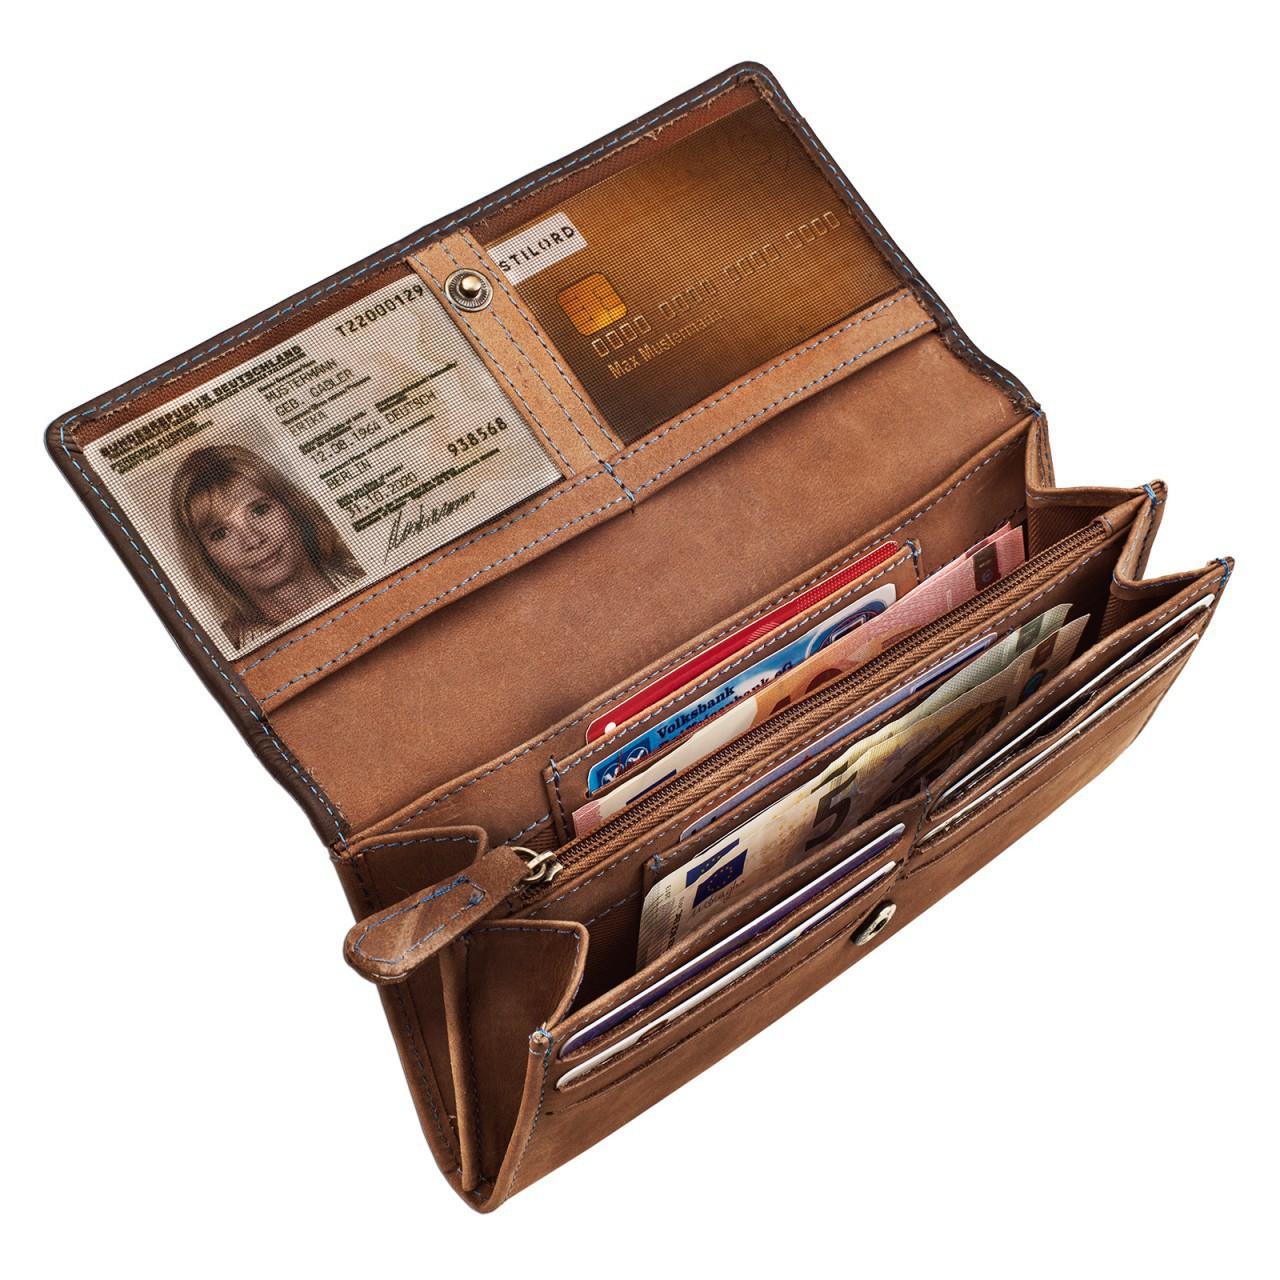 STILORD Leder Portemonnaie Quer mit Reißverschluss Leder Geldbeutel Etui Kellnerbörse Wallet 12 Kartenfächer Büffel-Leder braun - Bild 5